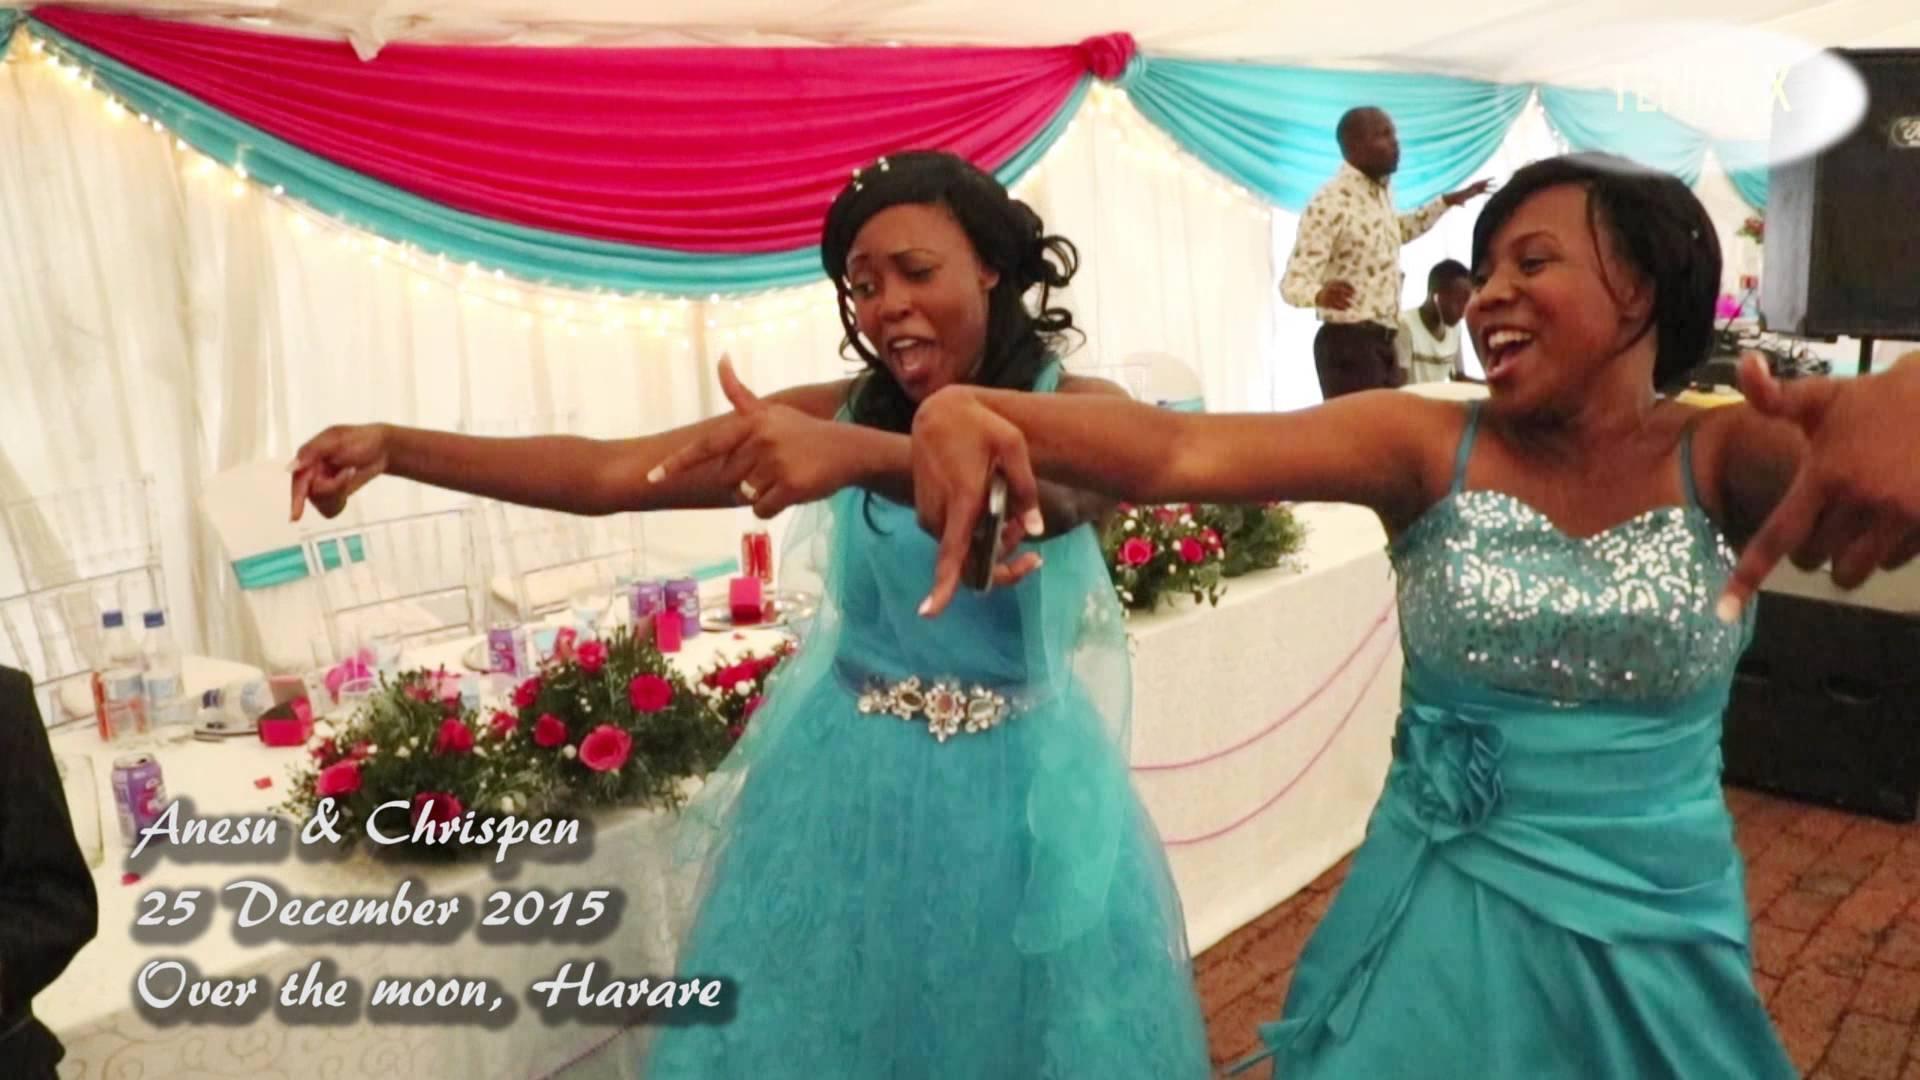 zimbabwe wedding dance - maproblems ese disappear